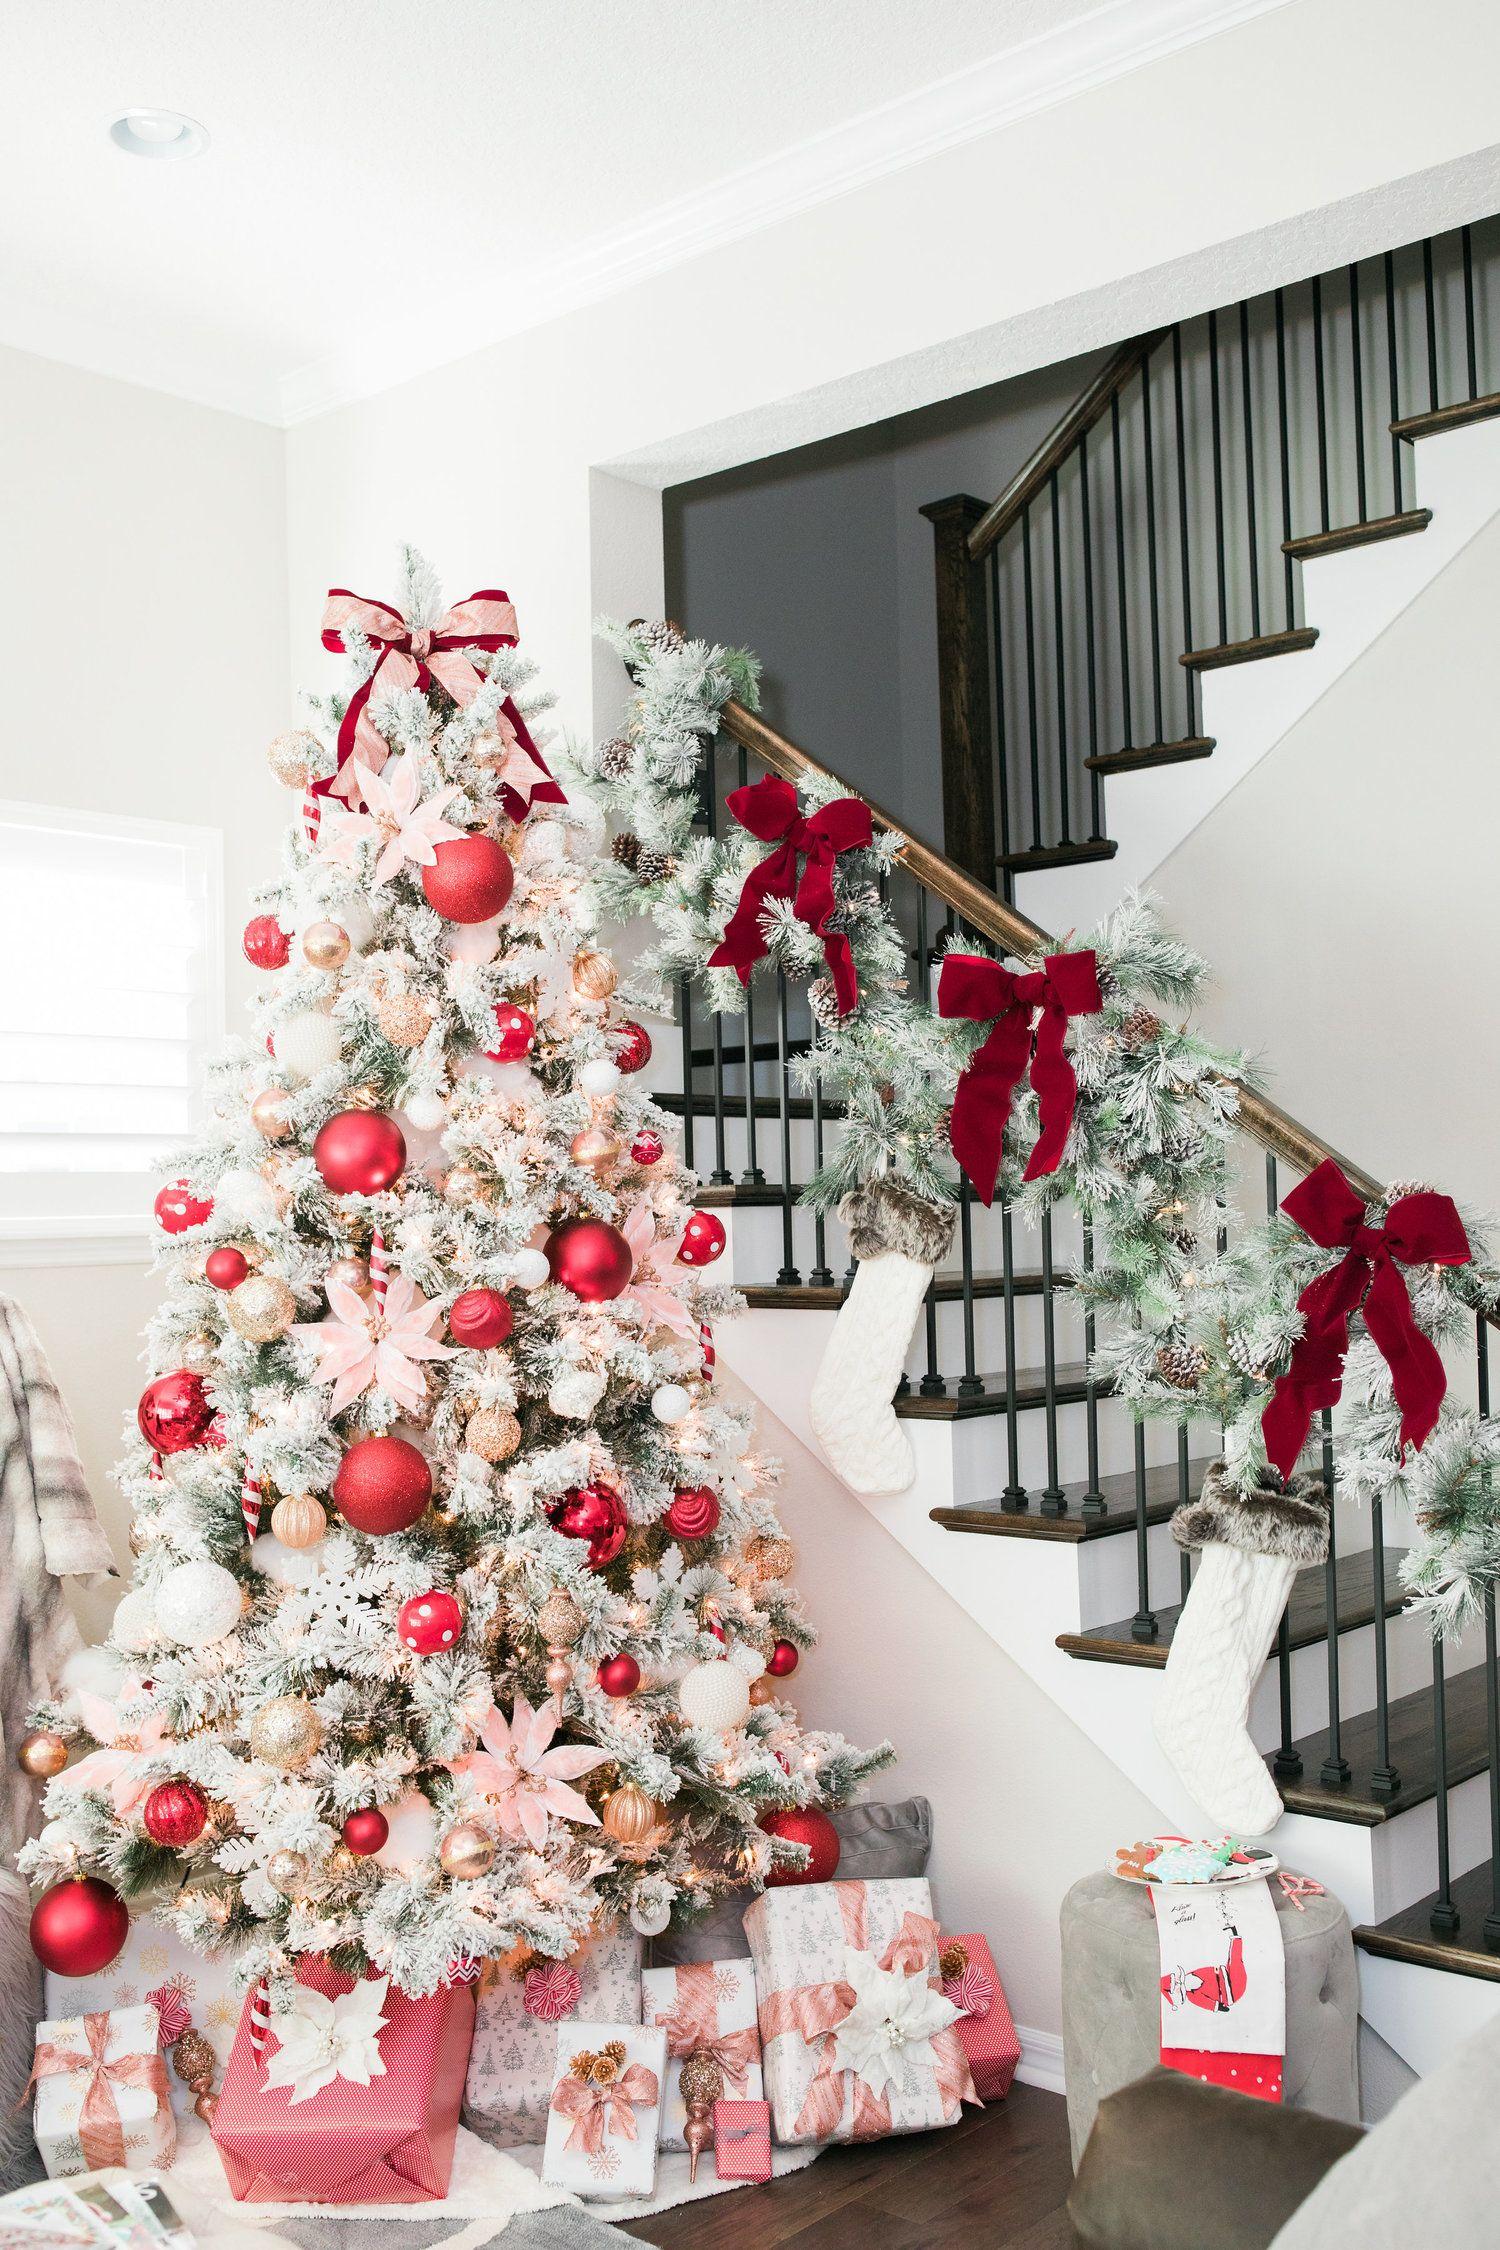 White flocked whimsical glamorous Christmas tree, decorated with ...